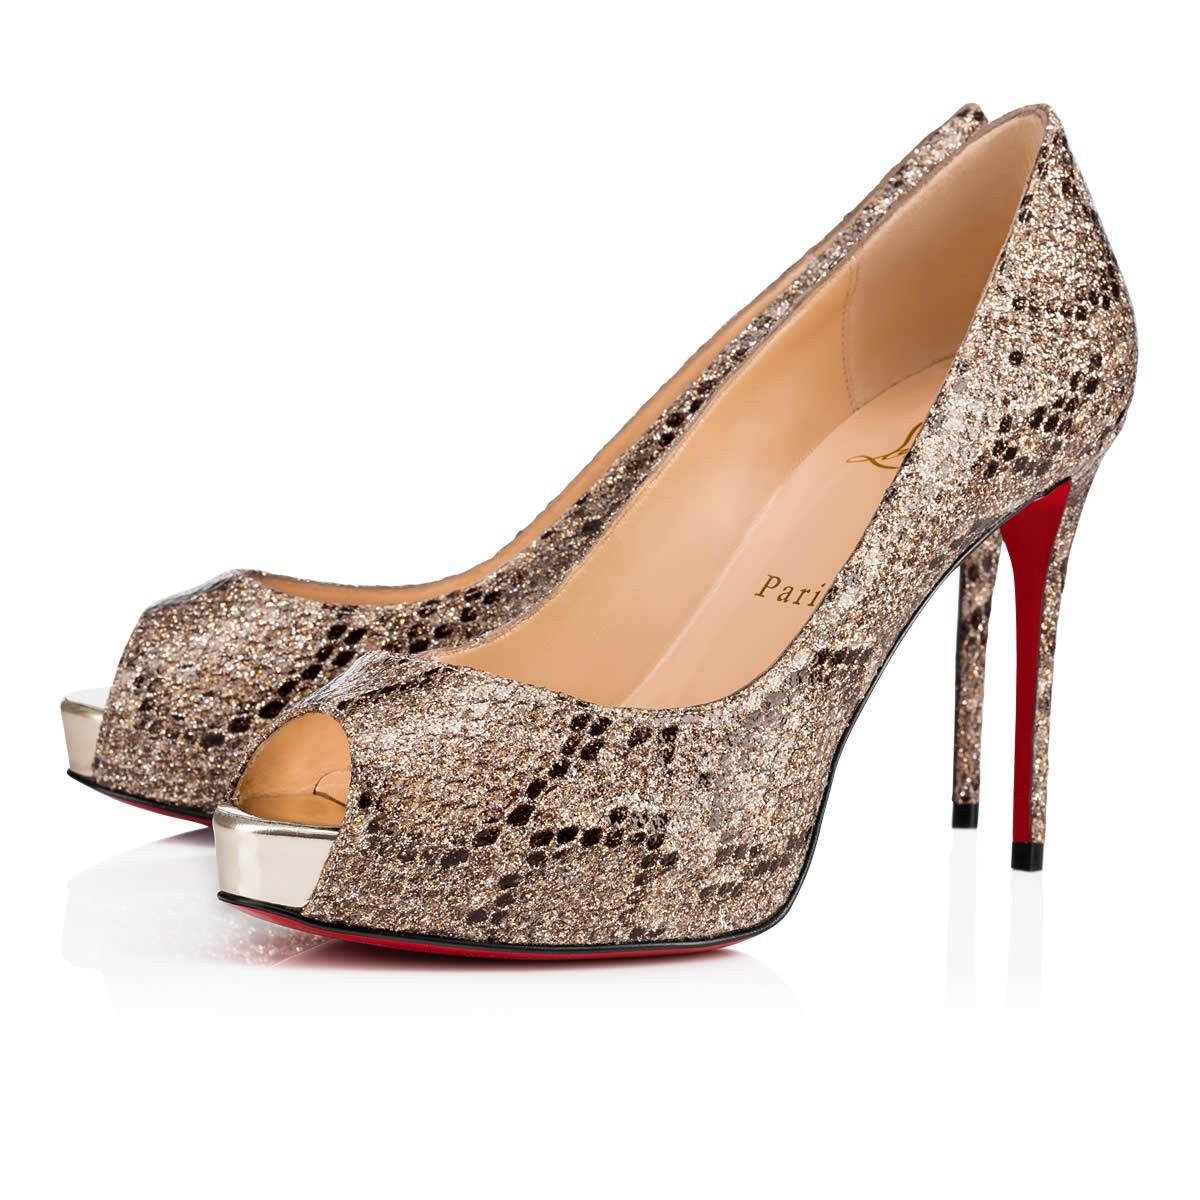 446d89cb295 CHRISTIAN LOUBOUTIN New Very Prive 100 Roccia Light Gold Glitter - Women  Shoes - Christian Louboutin.  christianlouboutin  shoes